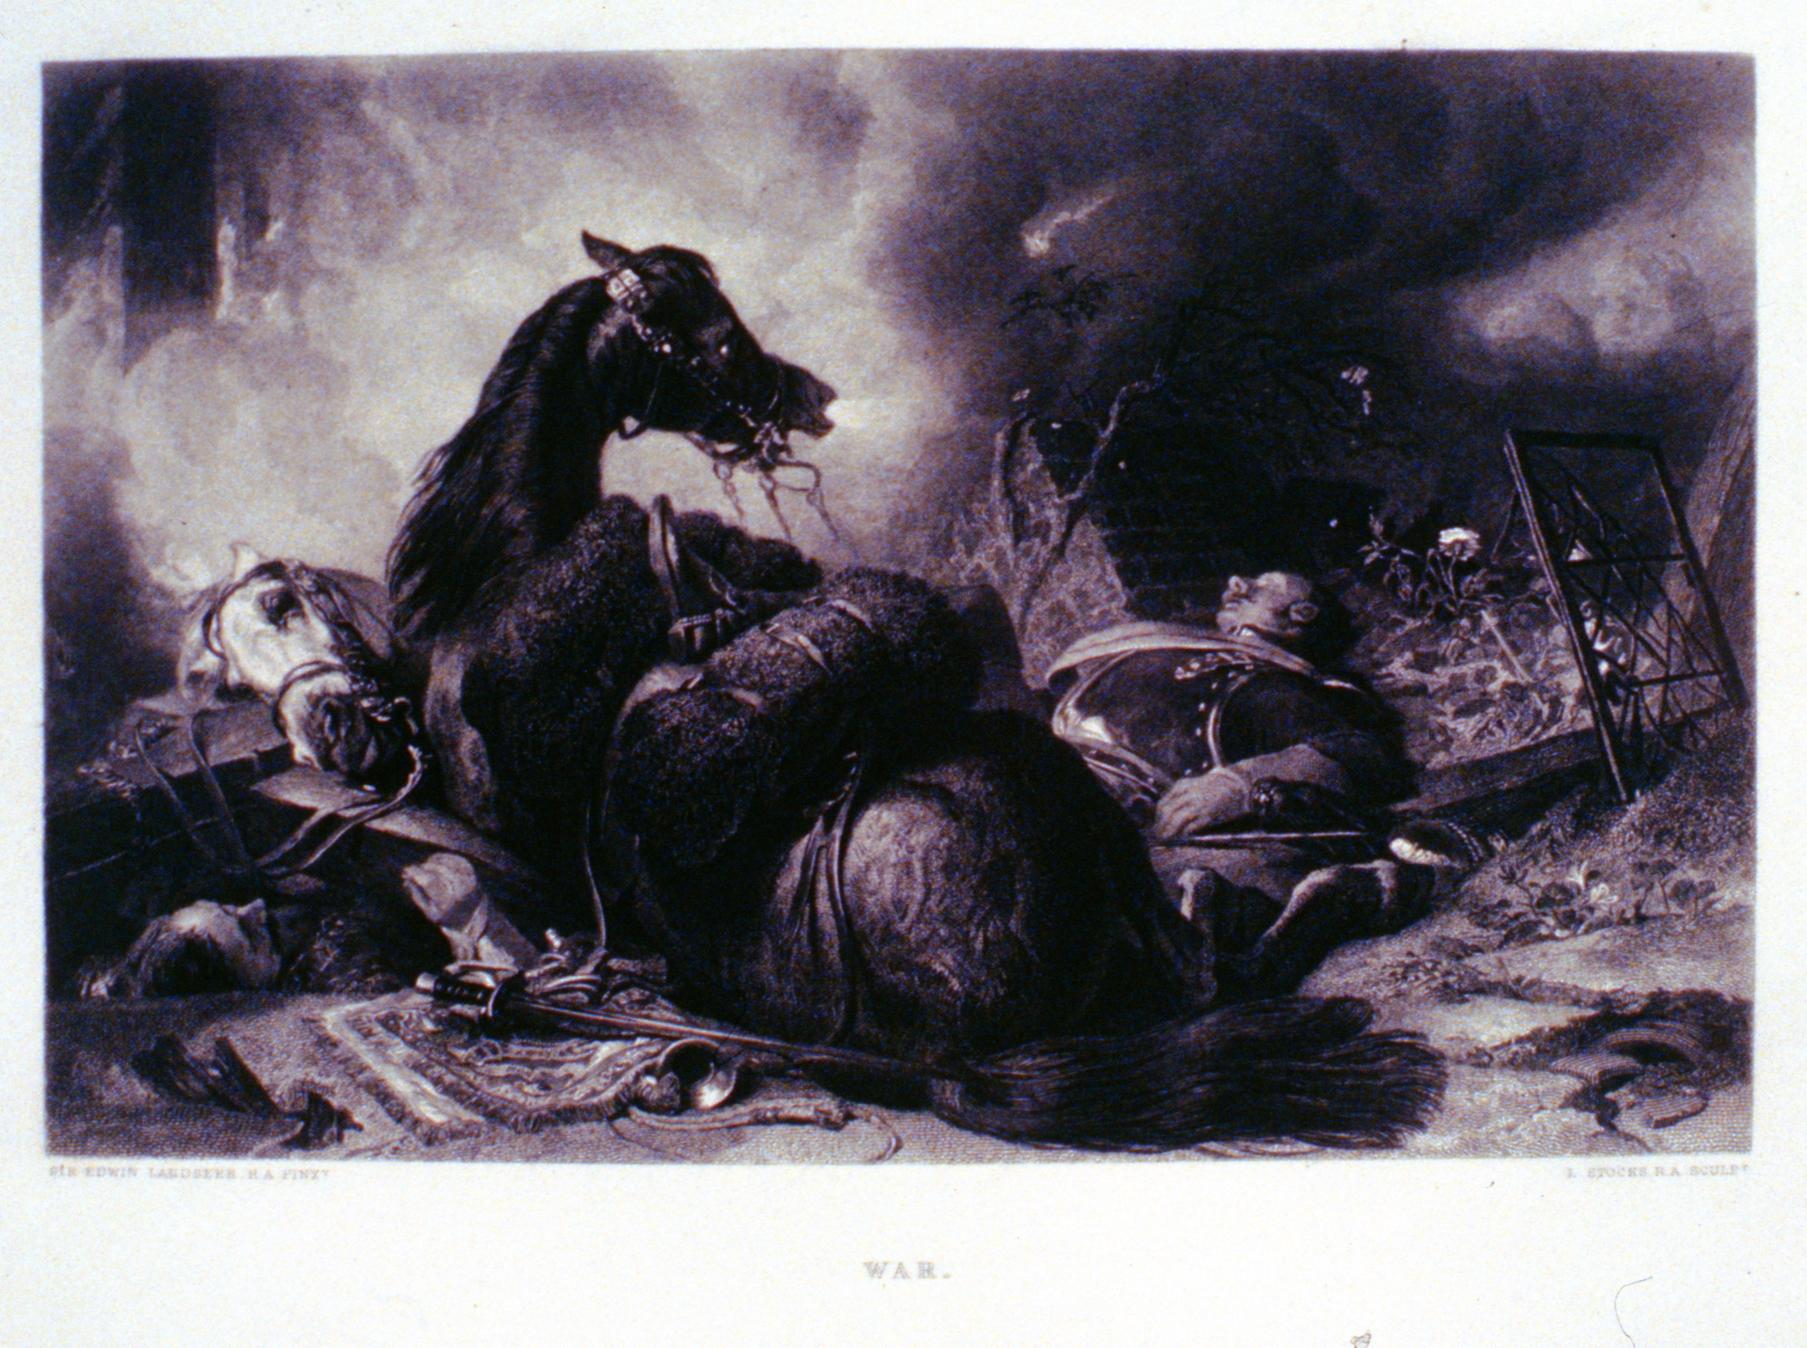 War , c. late 19th Century, L. Stocks, steel engraving, 16.5 cm x 25.6 cm, 1996.08.07, gift of Yvonne Adams